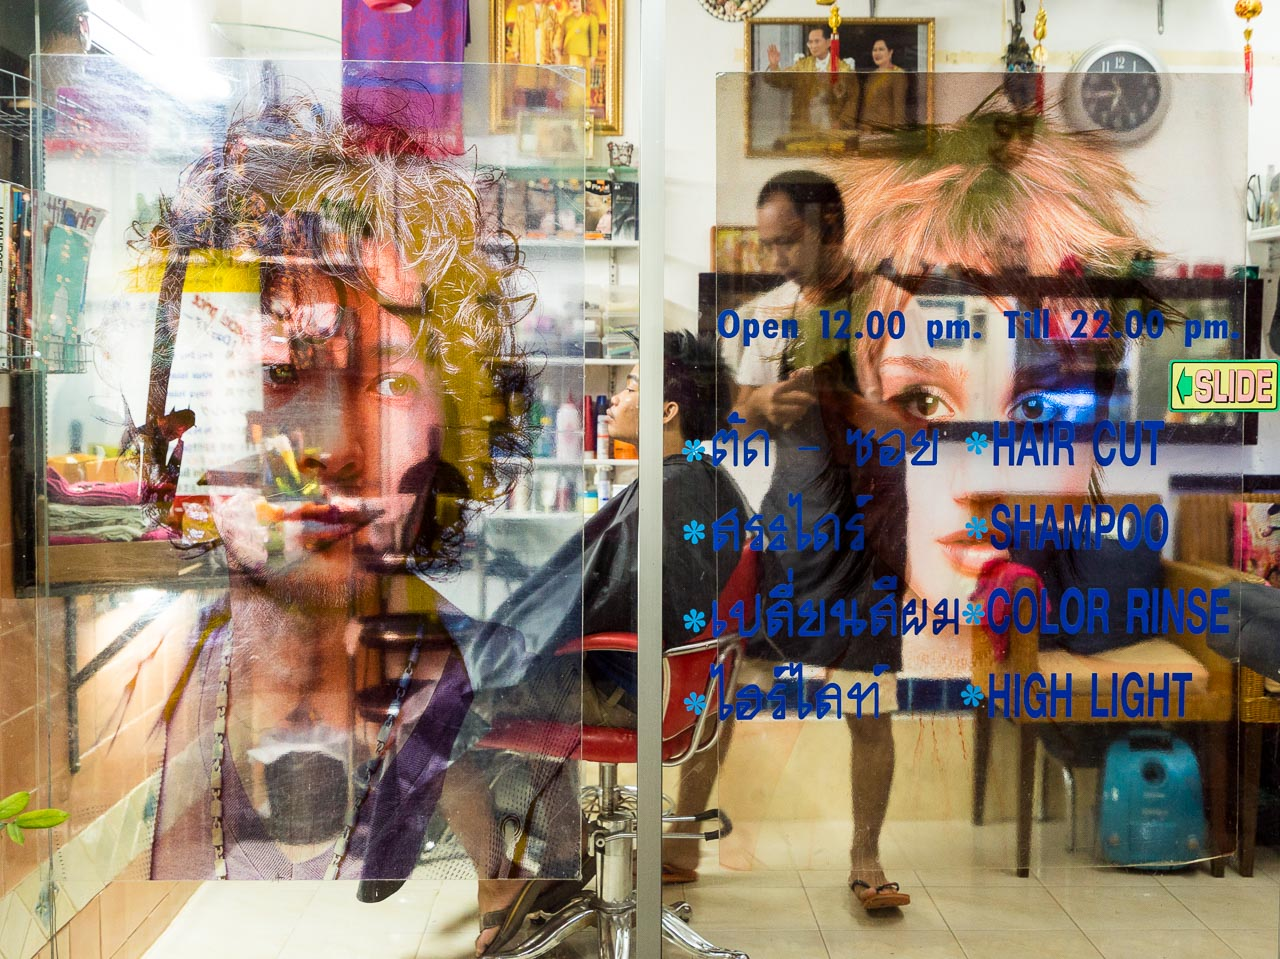 the stylist / phuket, thailand